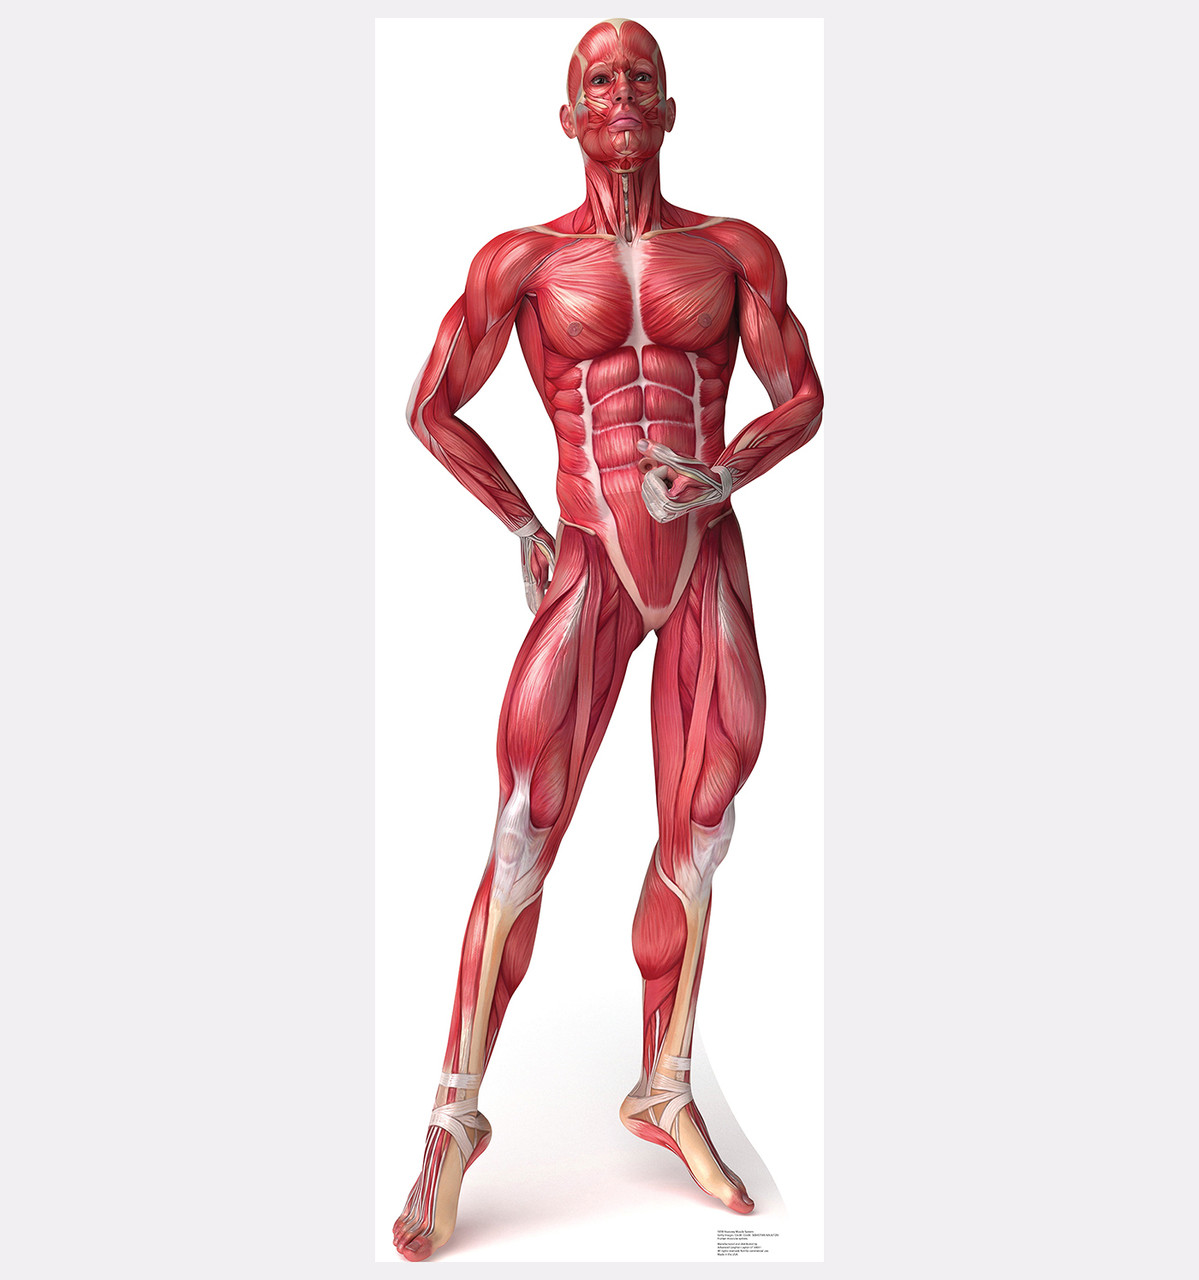 Life-size Muscle System - Anatomy Cardboard Standup | Cardboard Cutout